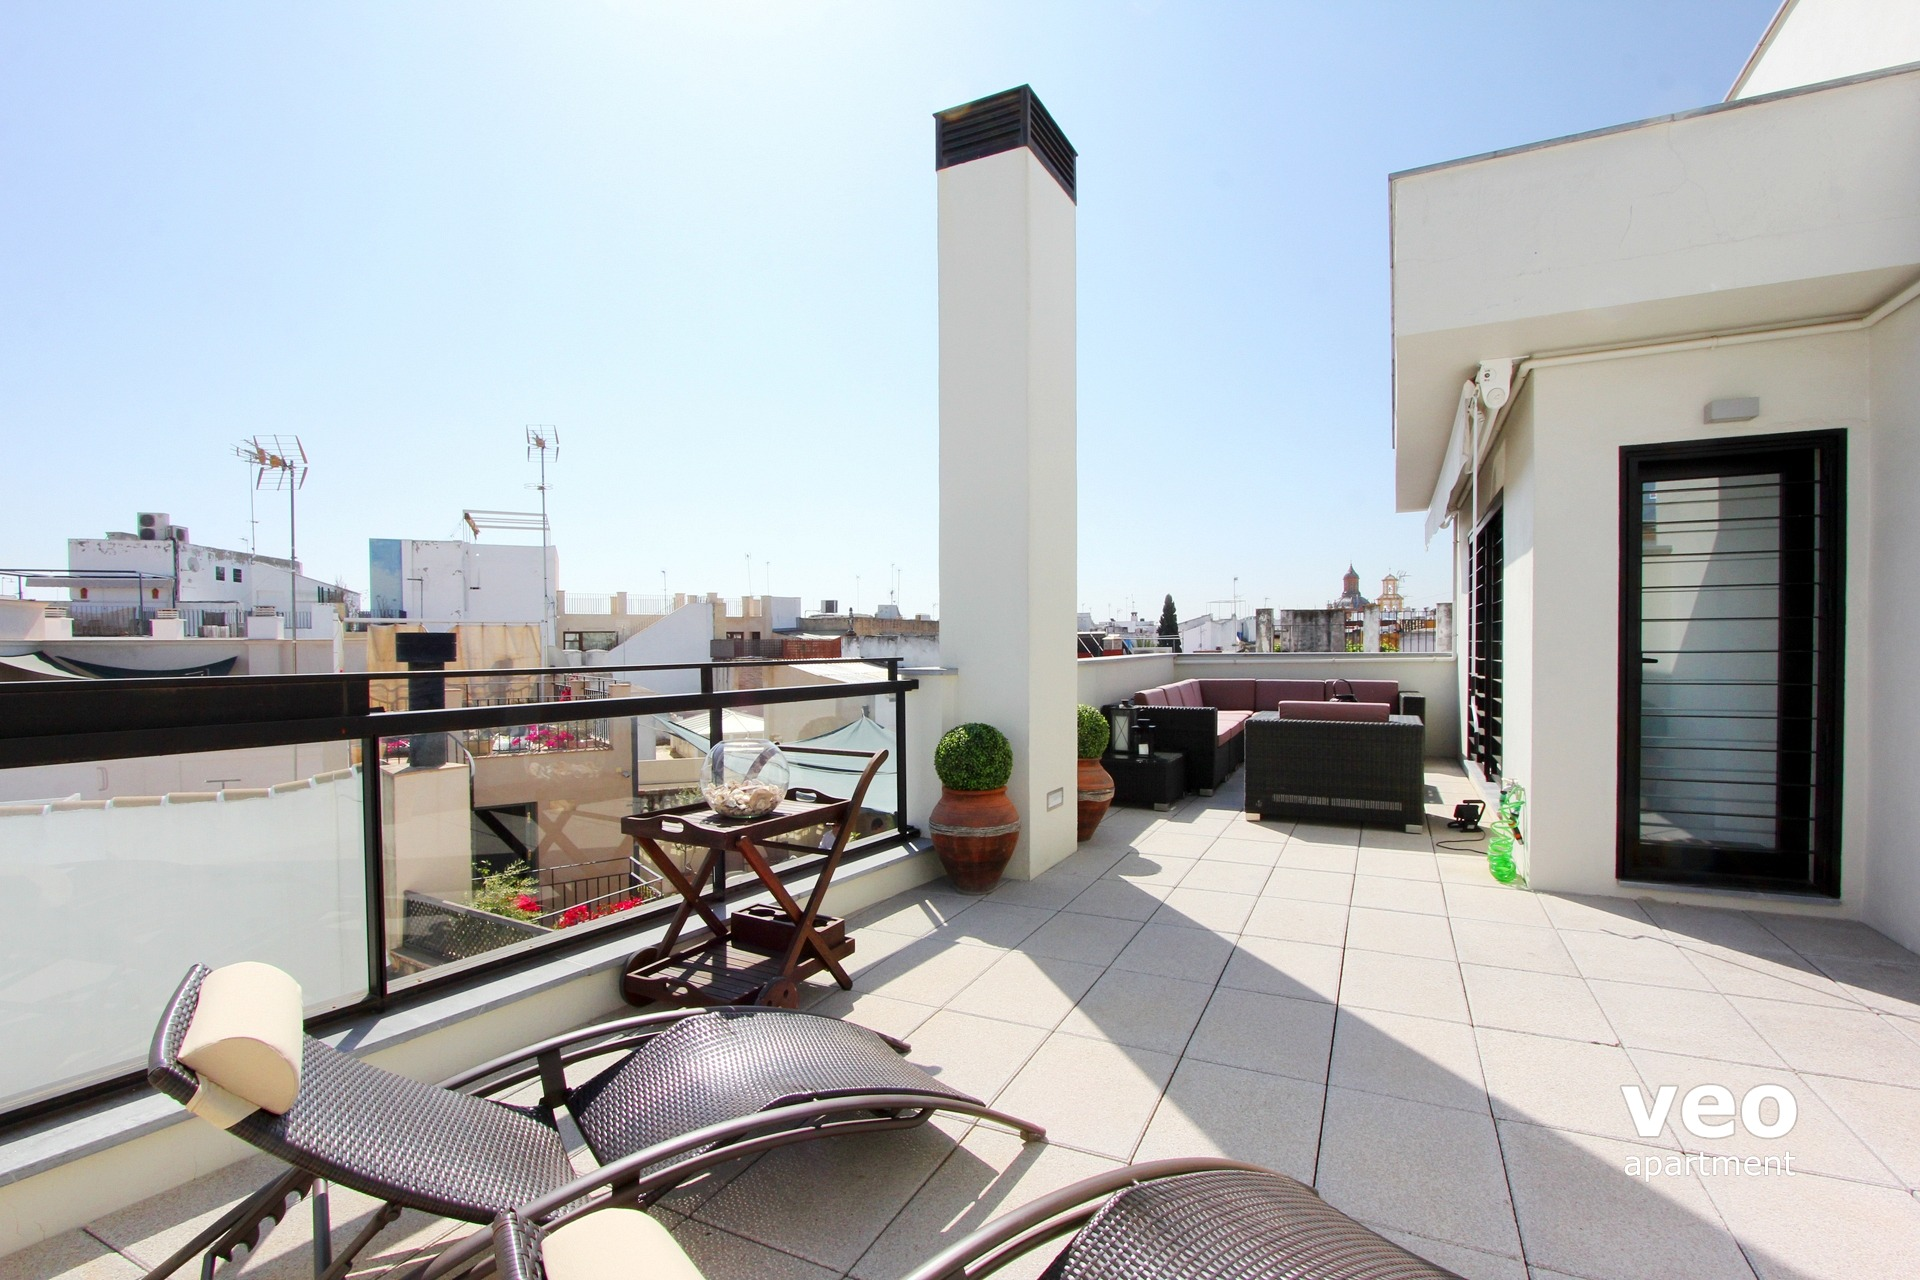 Appartement Rue Corral Del Rey Seville Espagne Corral Rey Terrasse